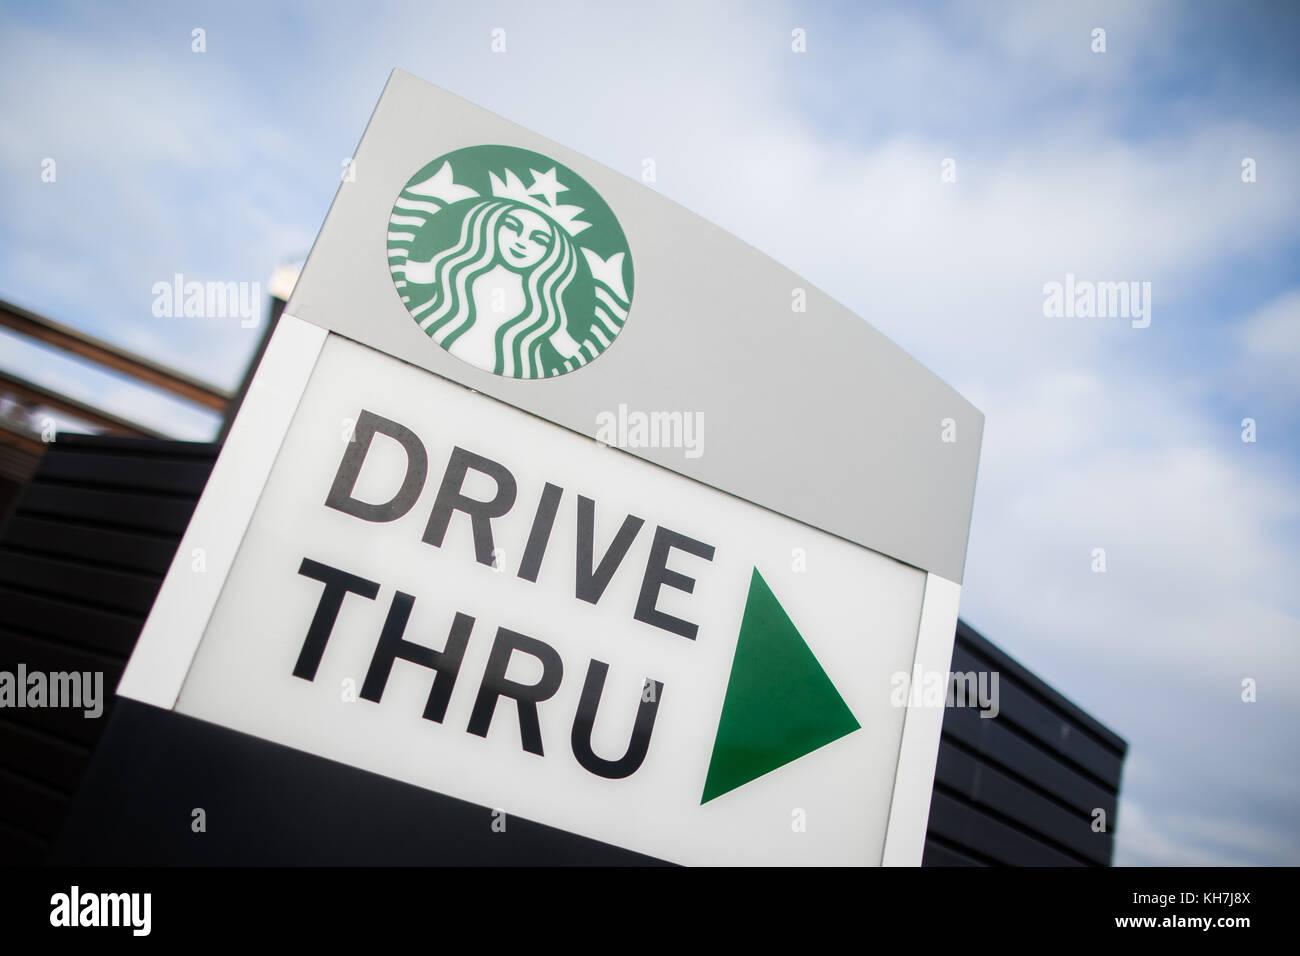 Starbucks Drive Thru Stock Photos & Starbucks Drive Thru Stock ...